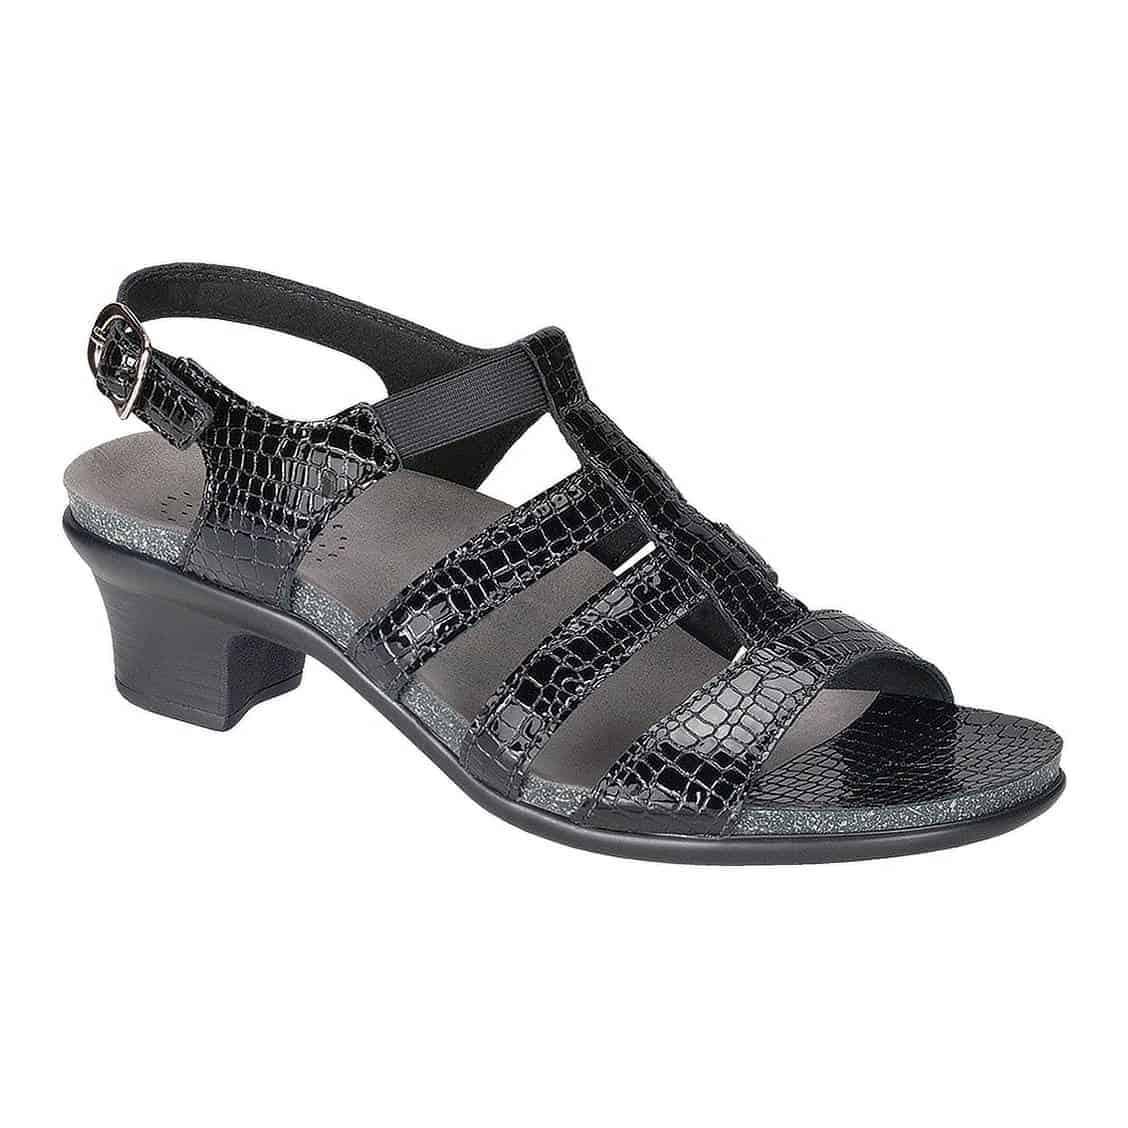 sas-womens-allegro-black-croc-2360-181-1